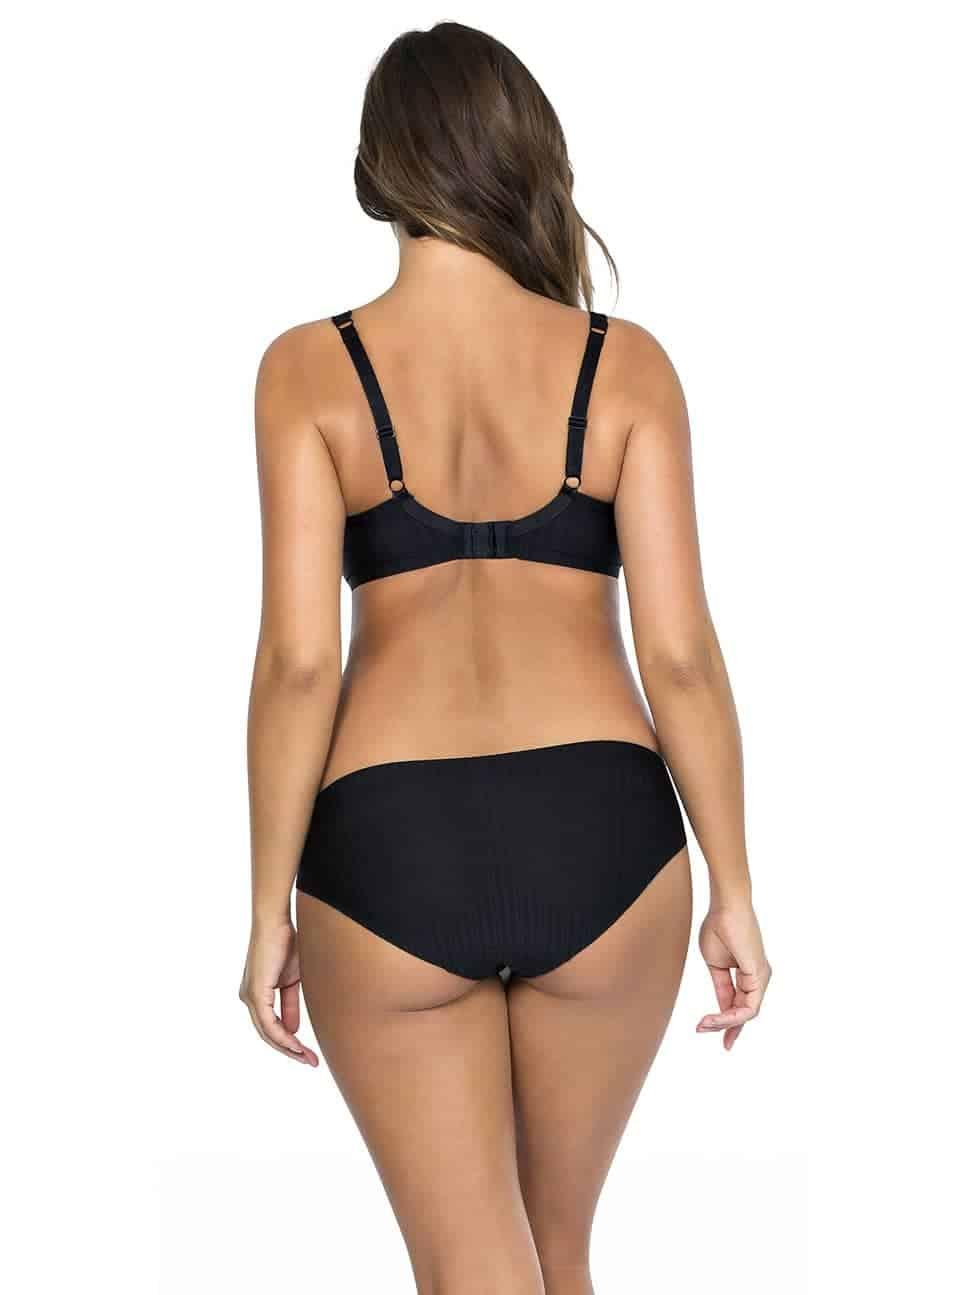 Aline TShirtBraP5251 BikiniP5253 Black Back - Aline T-shirt Bra - Black - P5251